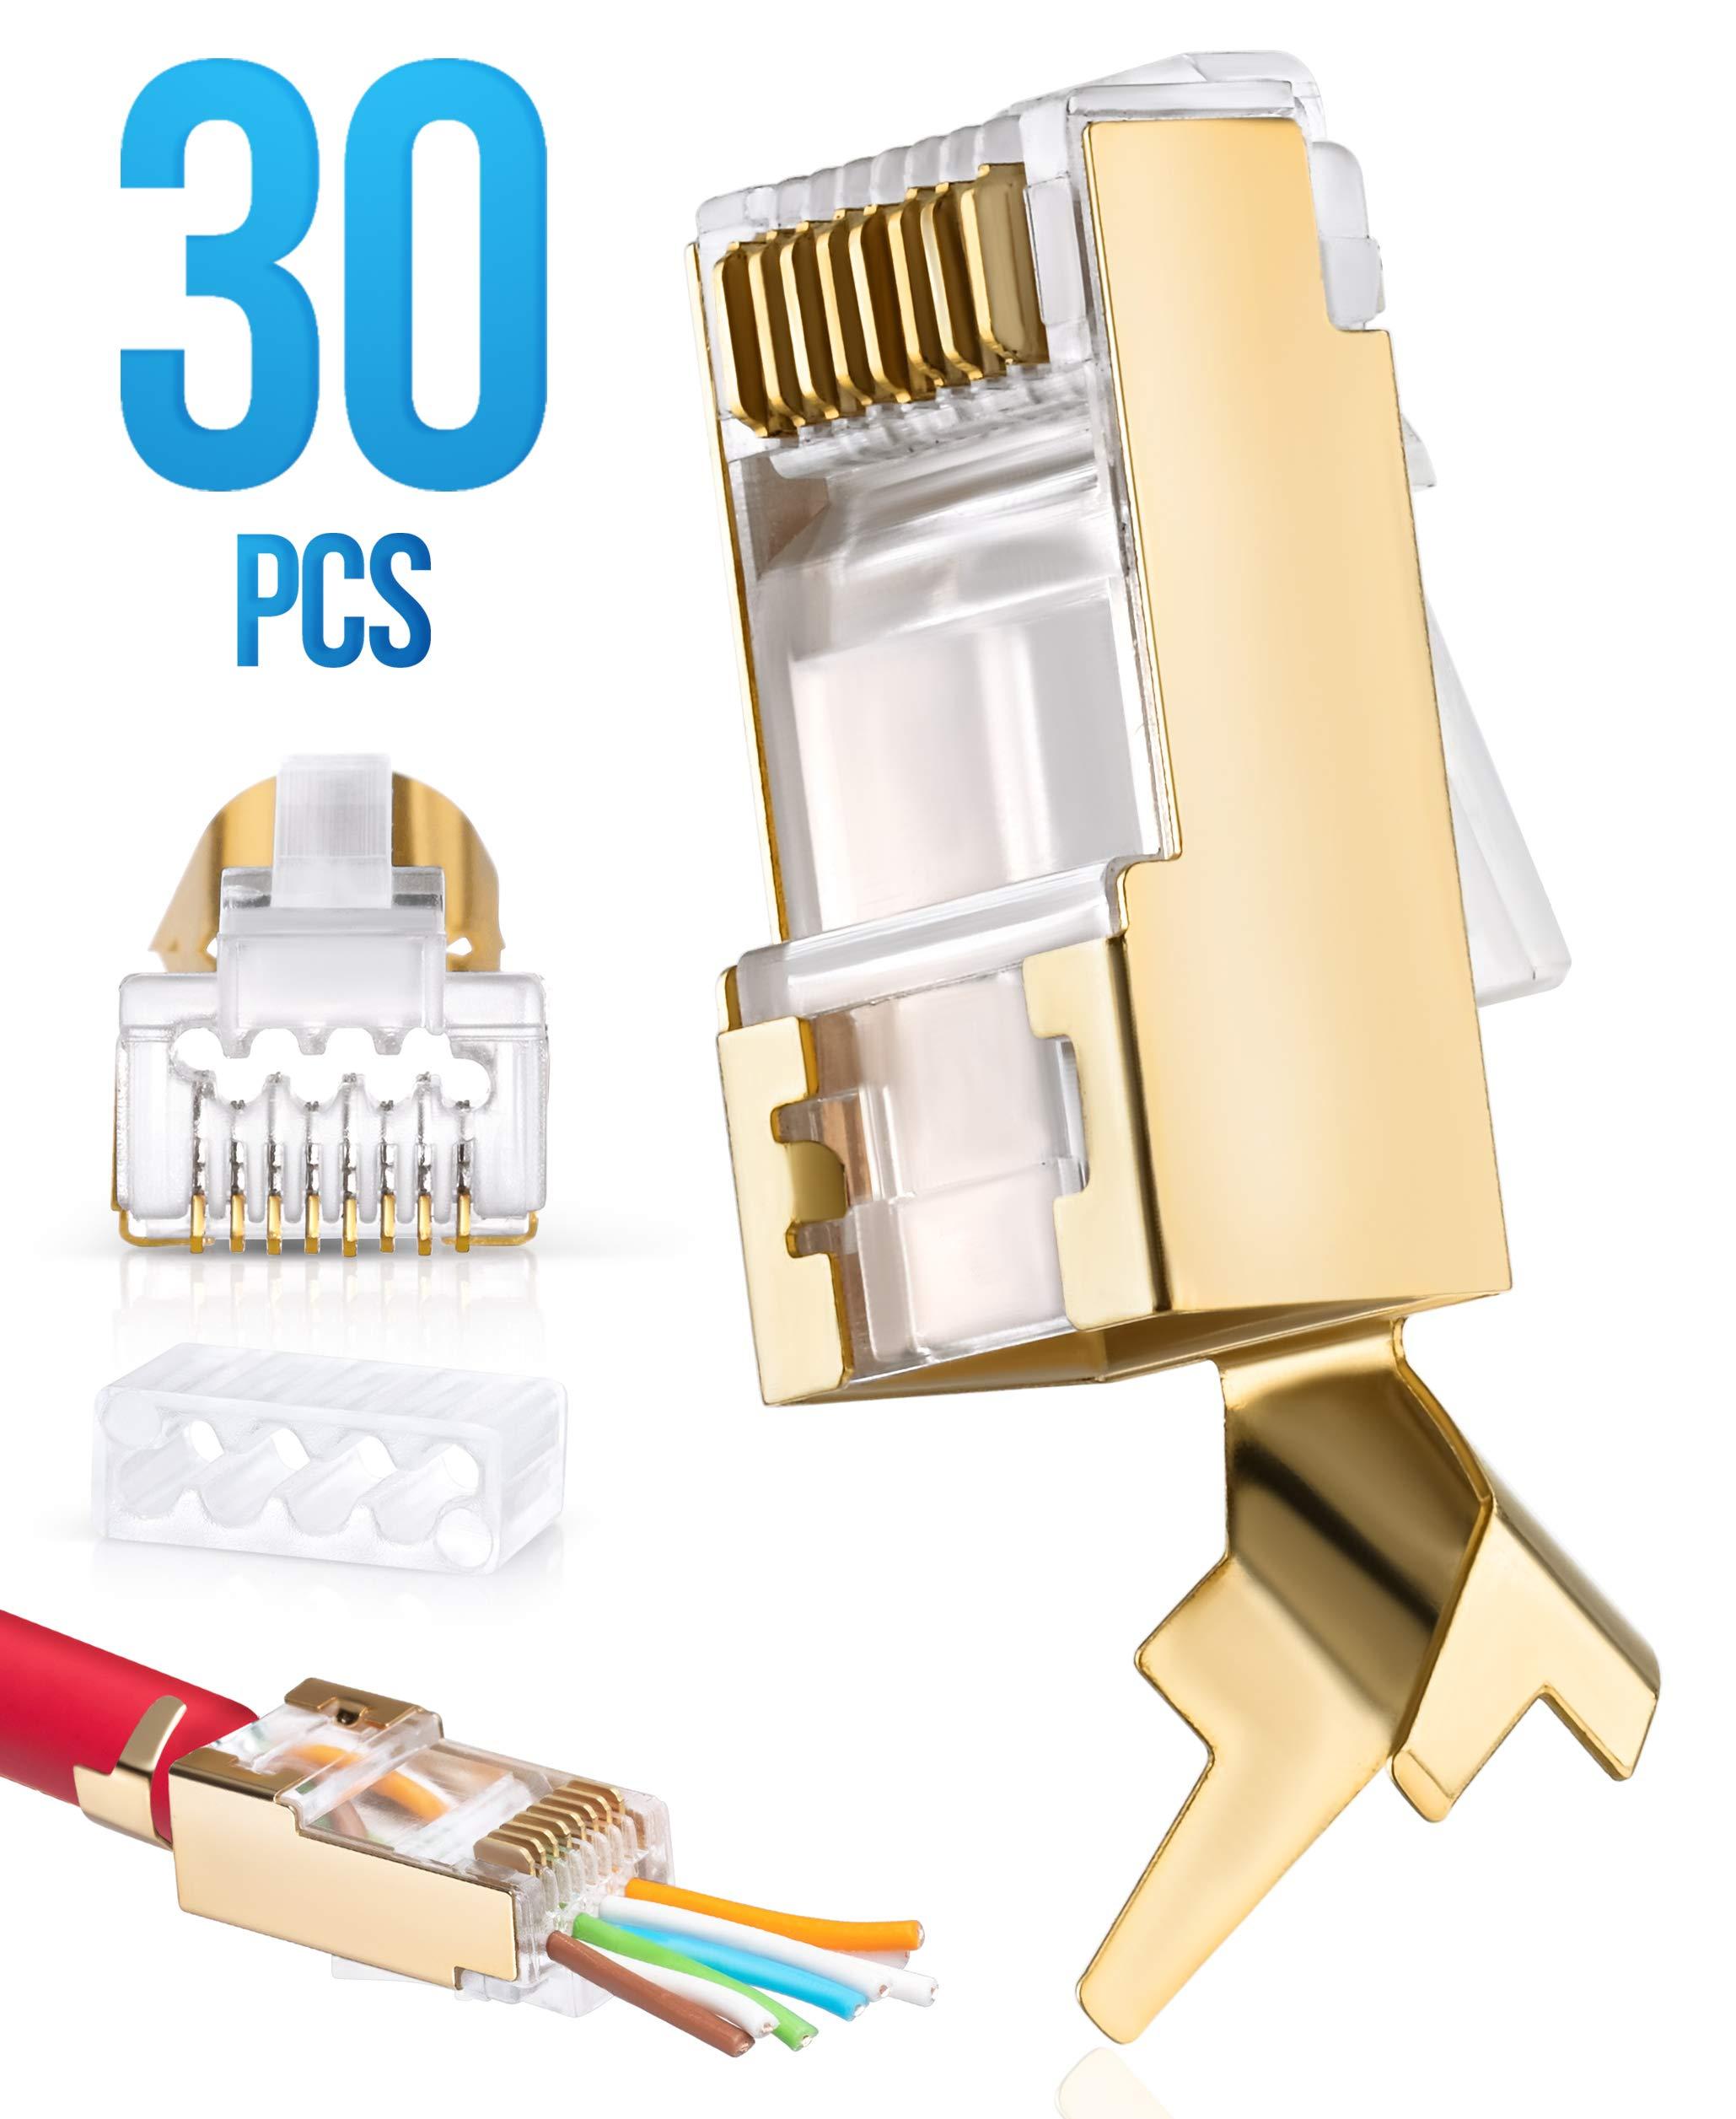 RJ45 Cat7 & Cat6/6A Pass Through connectors 30 Pcs | 8P8C 50UM Gold Plated Shielded Ftp/Sstp | EZ RJ45 Modular Plug for 24 - 23 AWG Ethernet Cable by EVEREST MEDIA SOLUTIONS